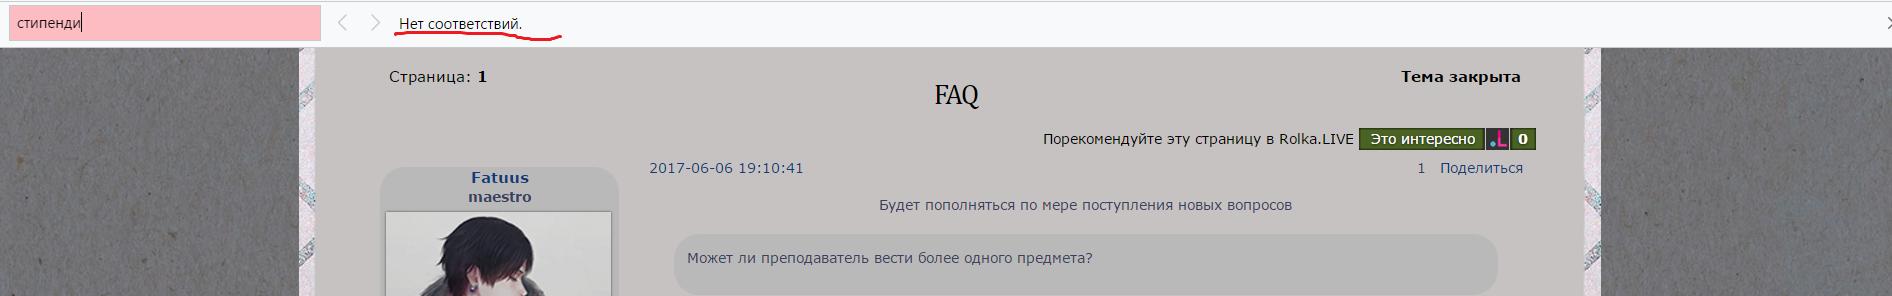 http://s8.uploads.ru/nvLF3.png